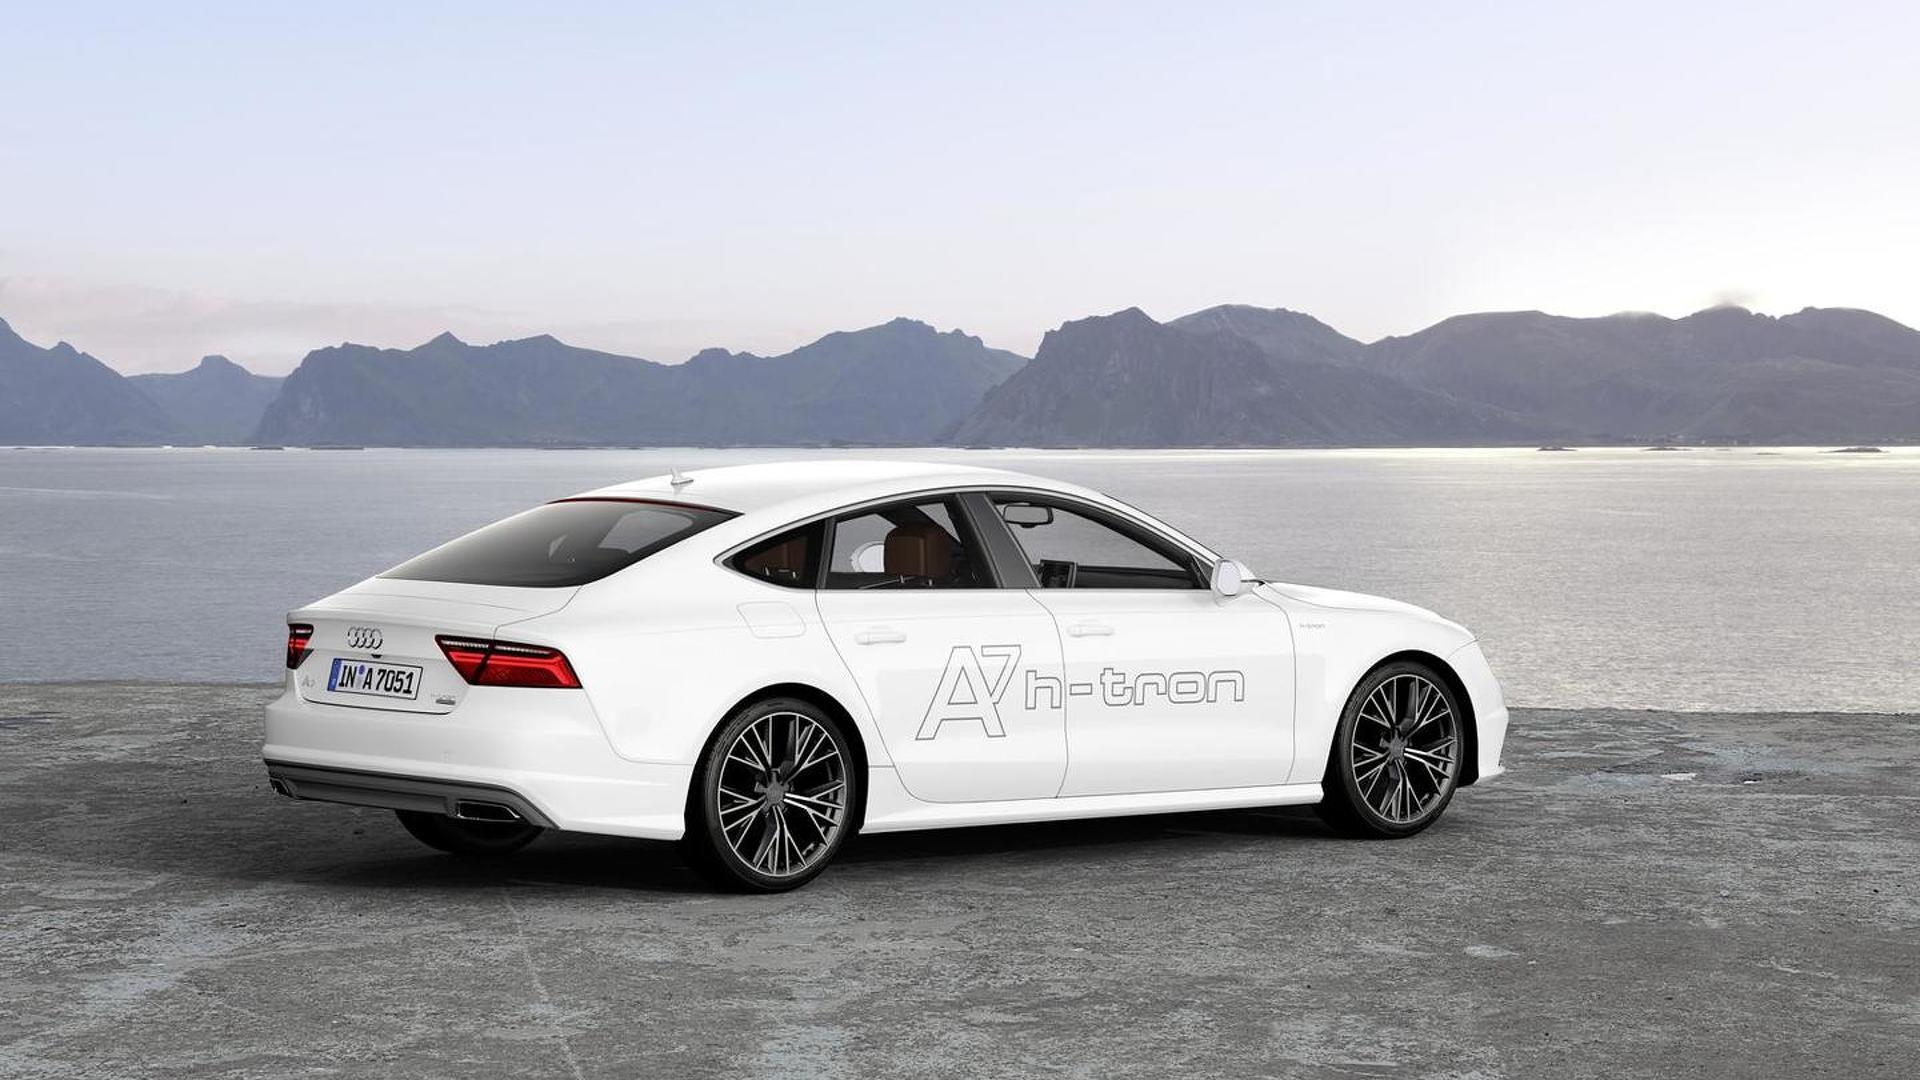 Водородная Audi A7 Sportback h-tron quattro concept 2014